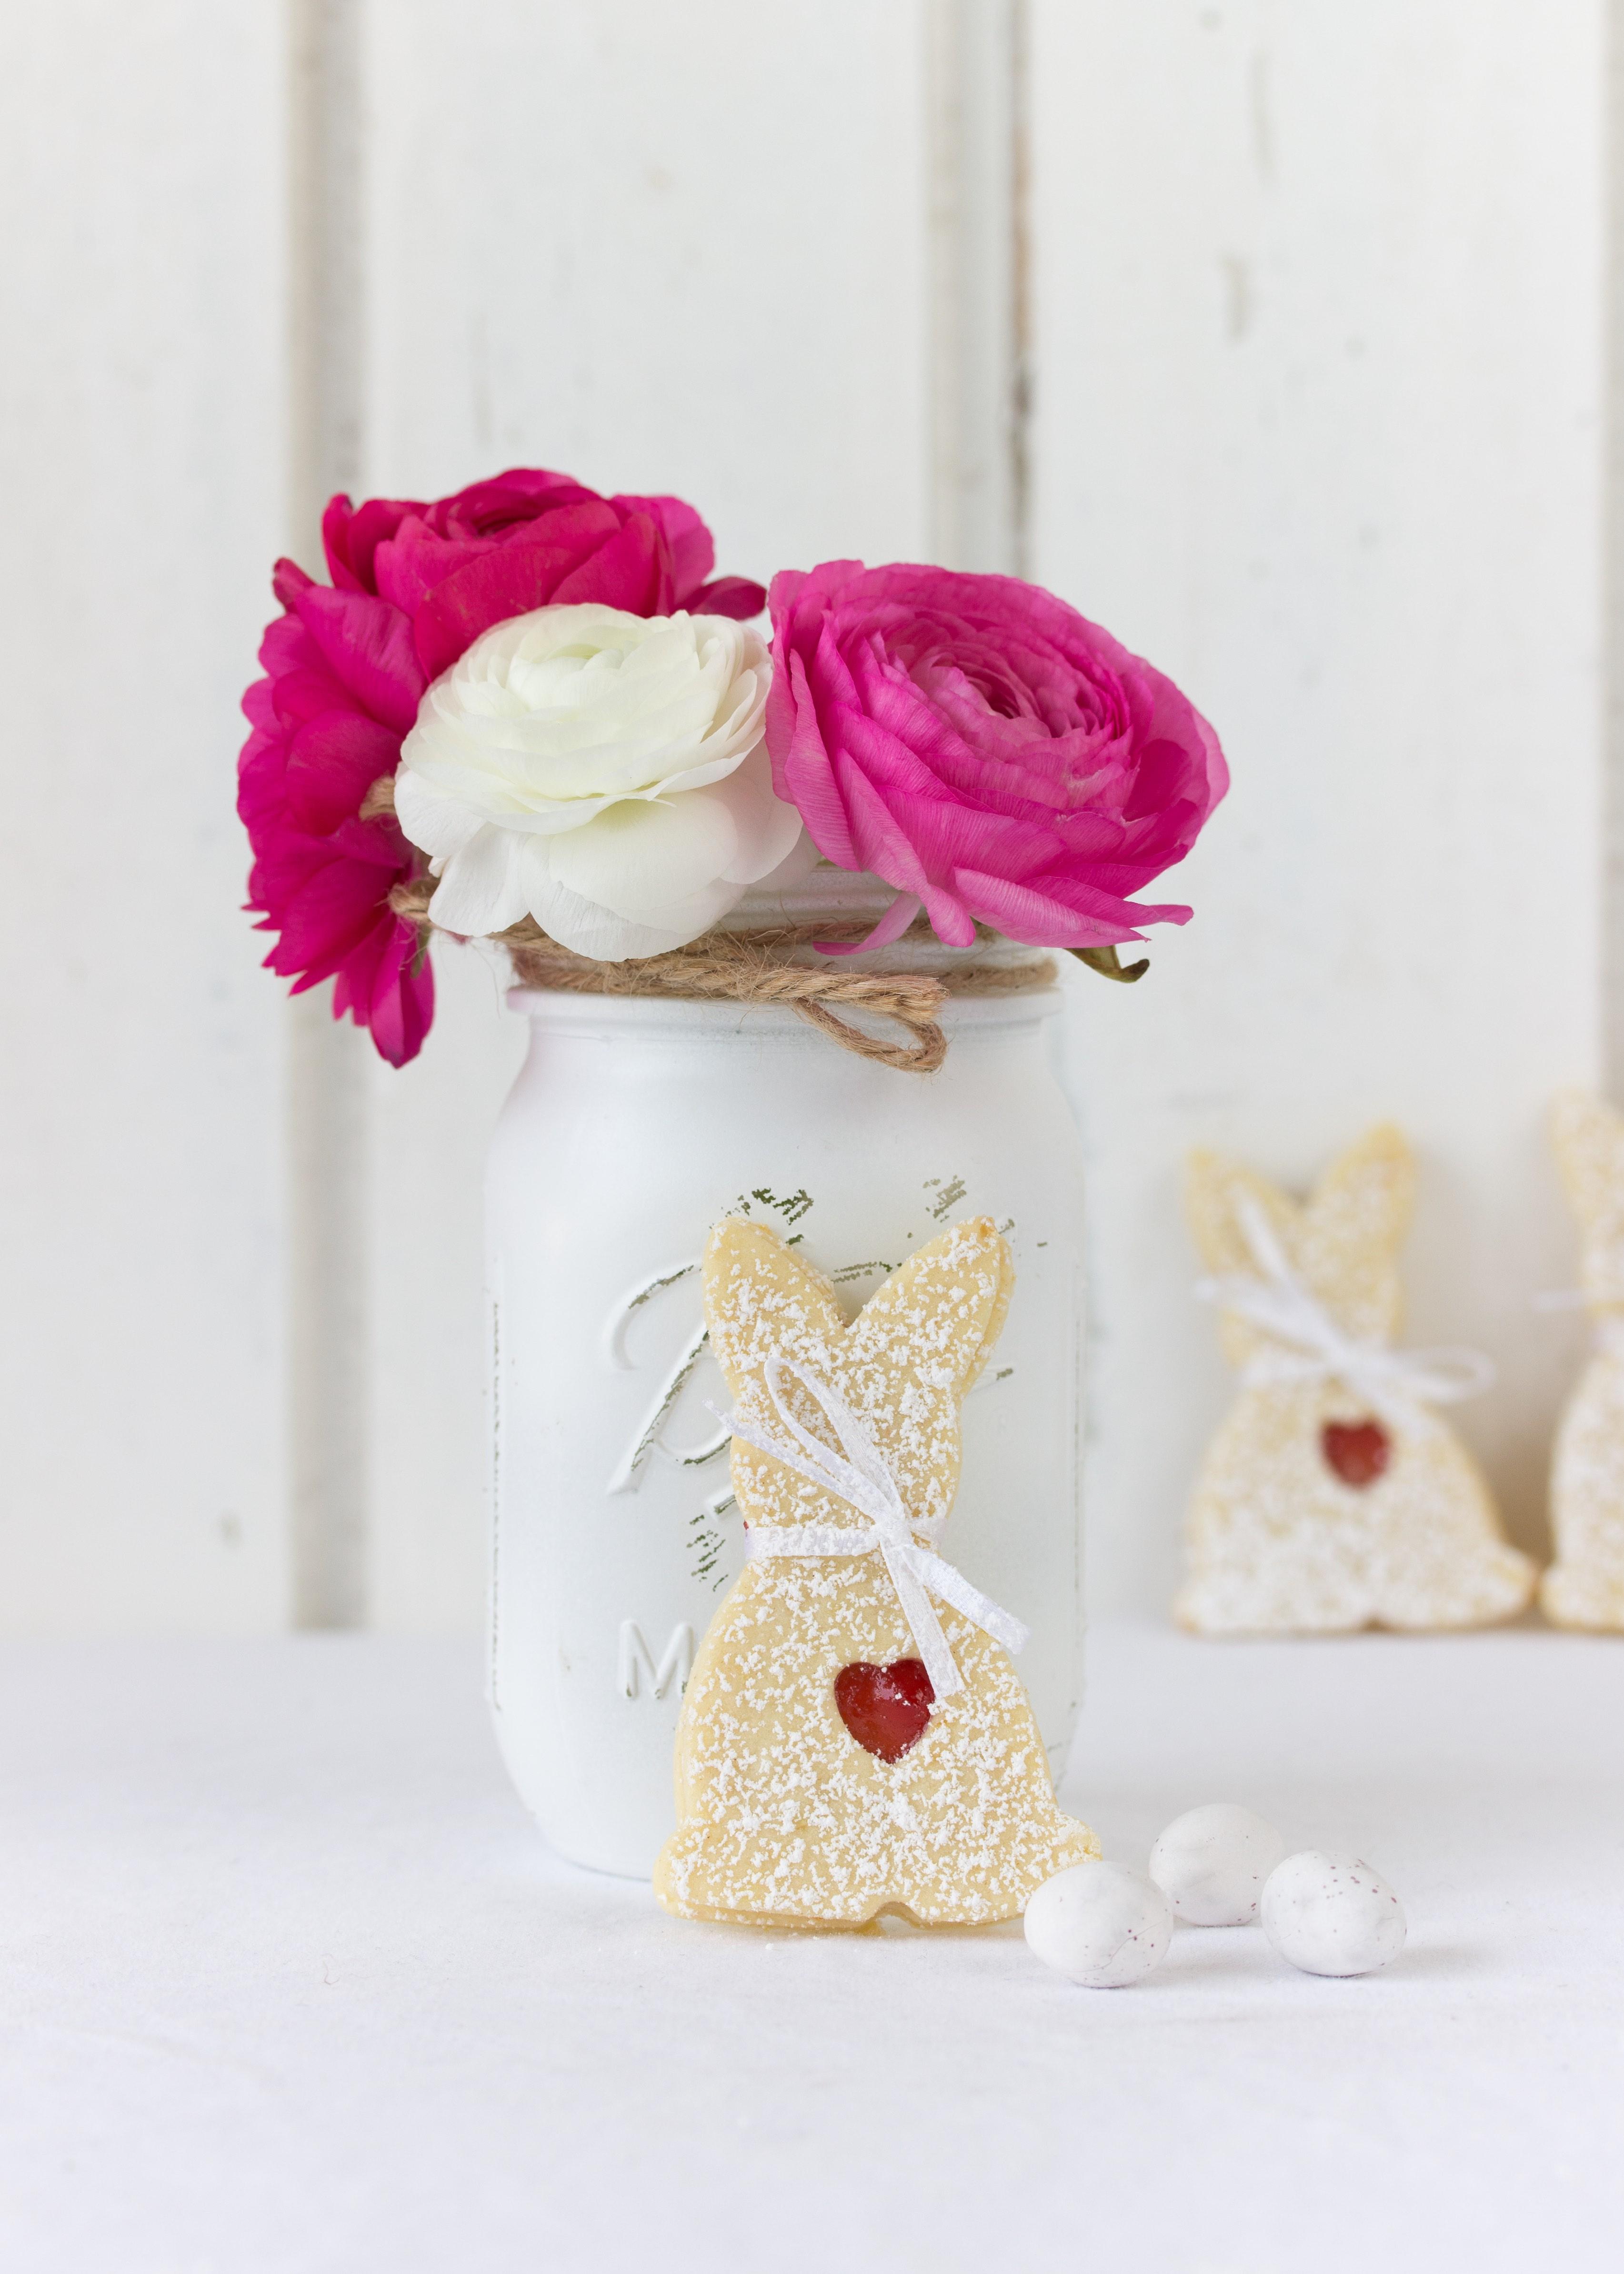 Osterhasen Kekse mit Marmelade backen Rezept Hasenkekse Ostern Kekse Plätzchen #cookies #easter #ostern #hasen | Emma´s Lieblingsstücke